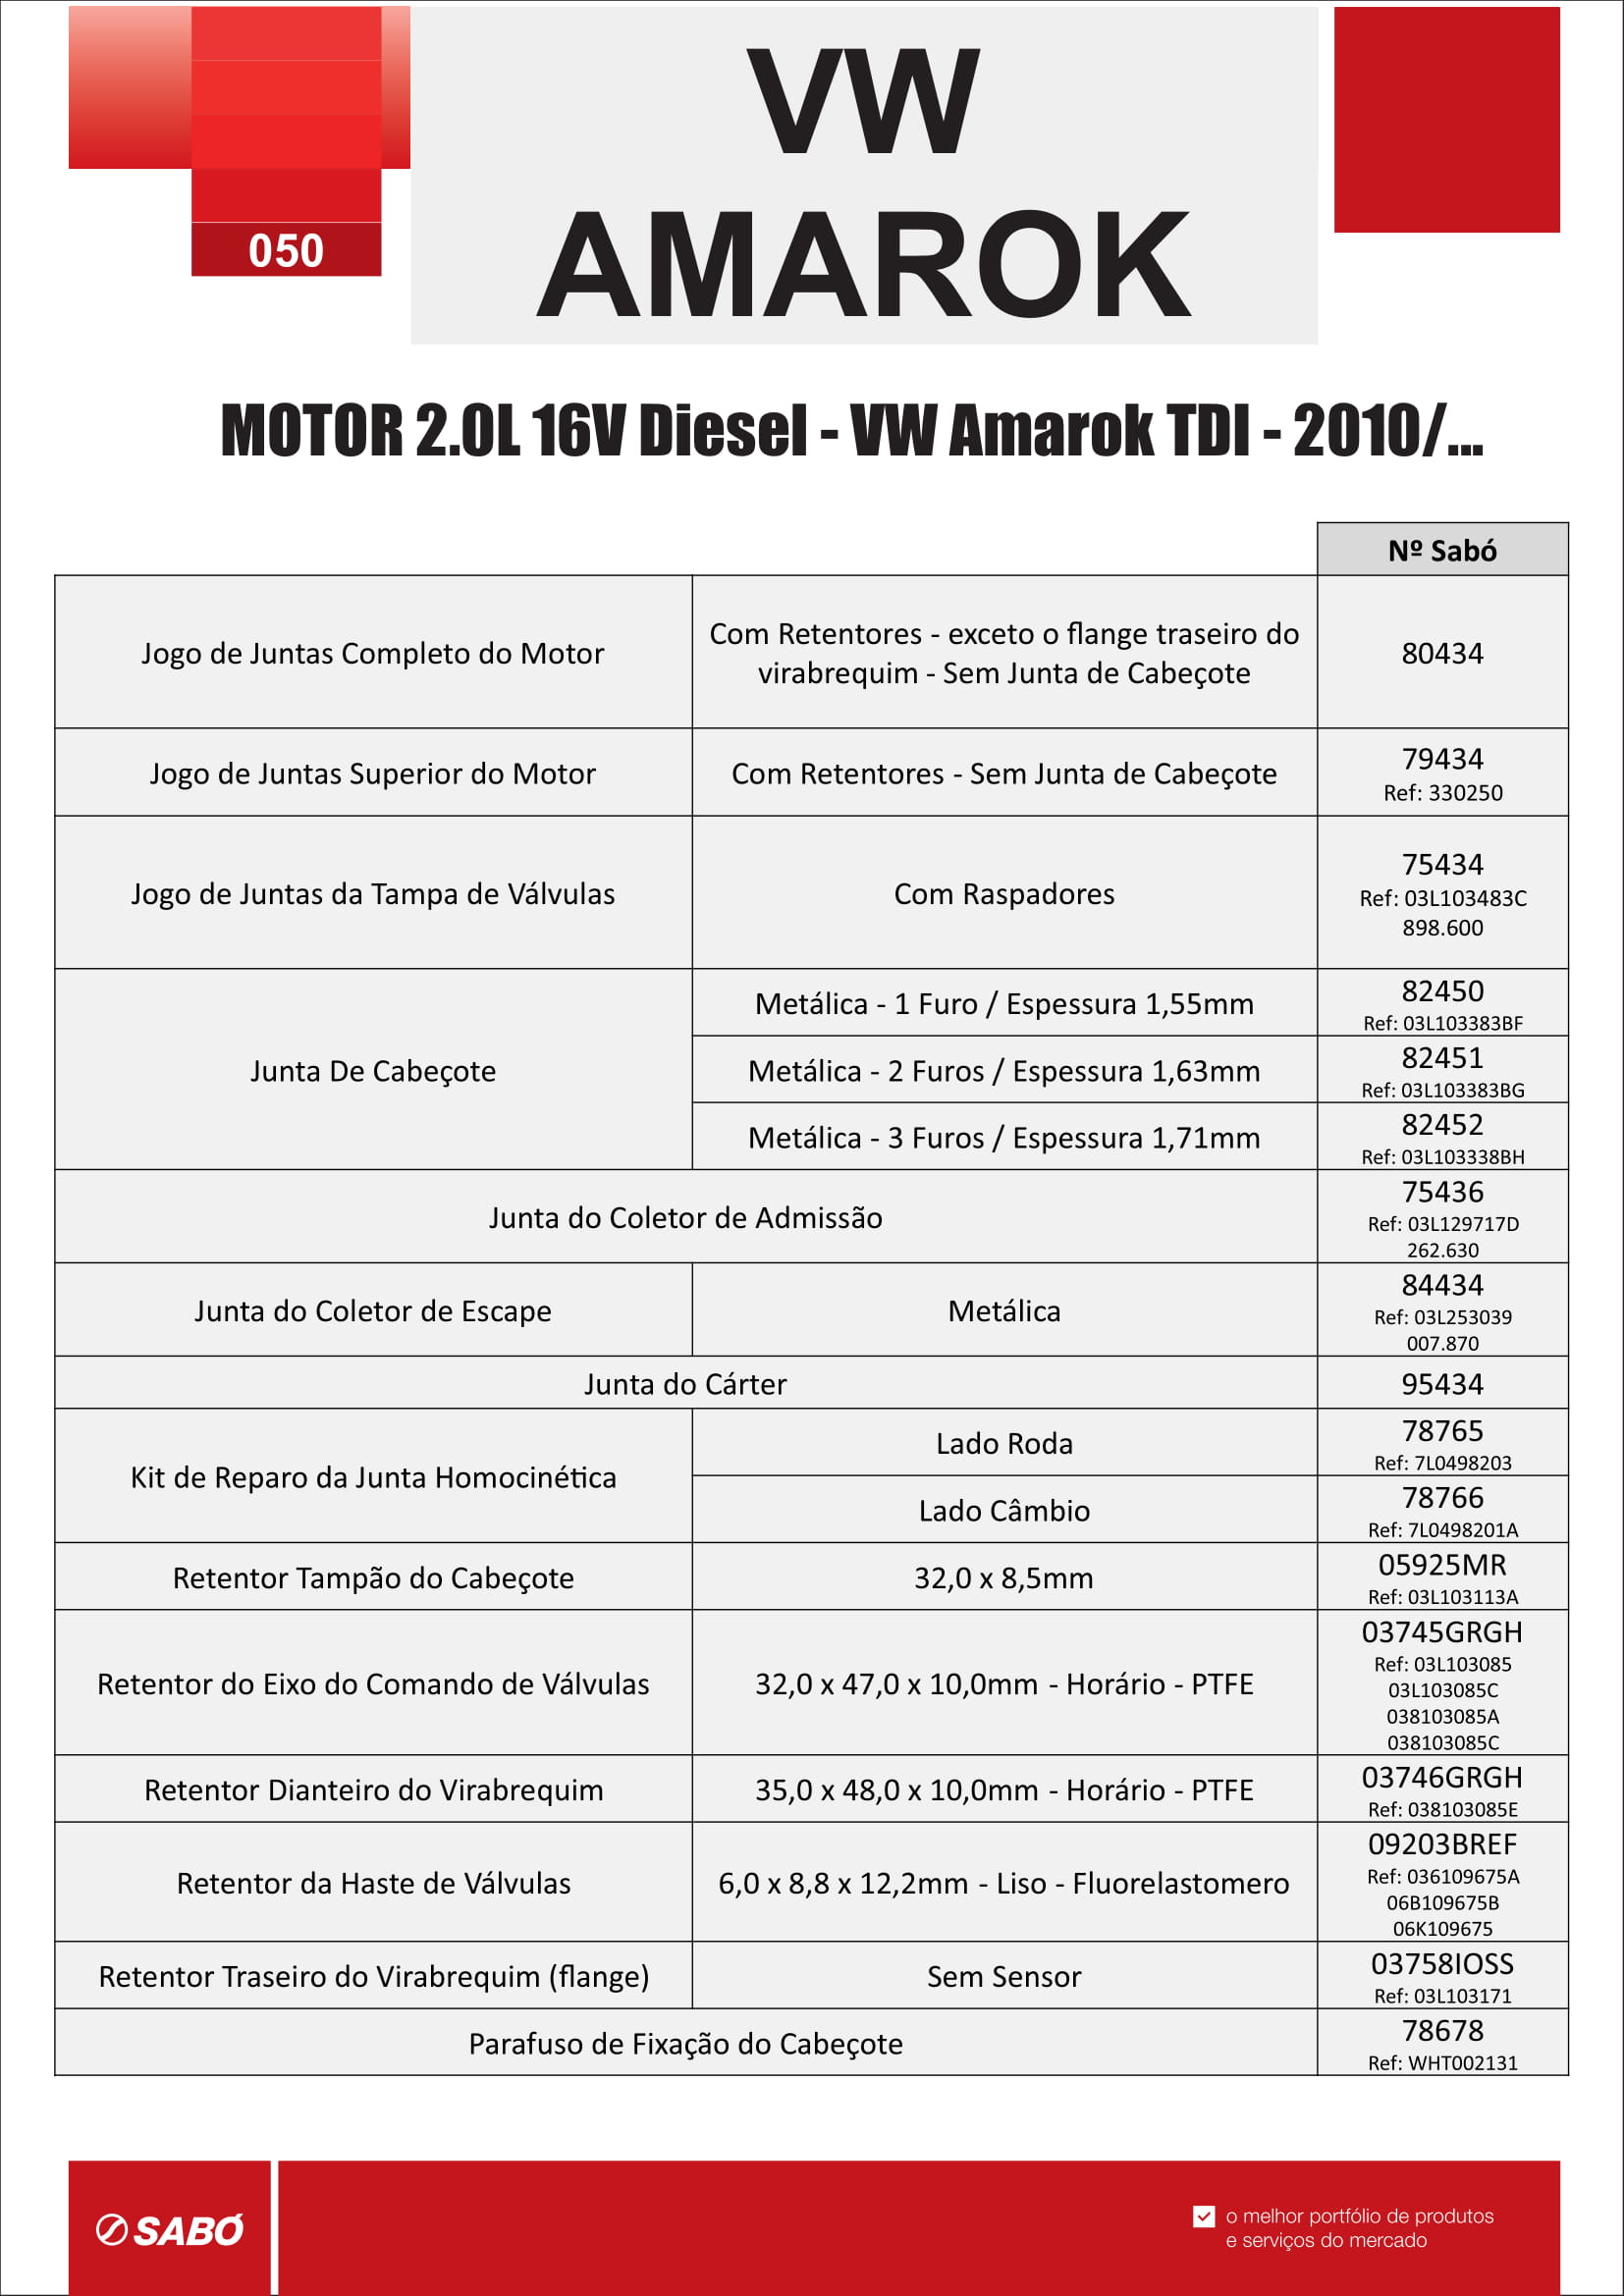 Inf. 050 - VW Amarok